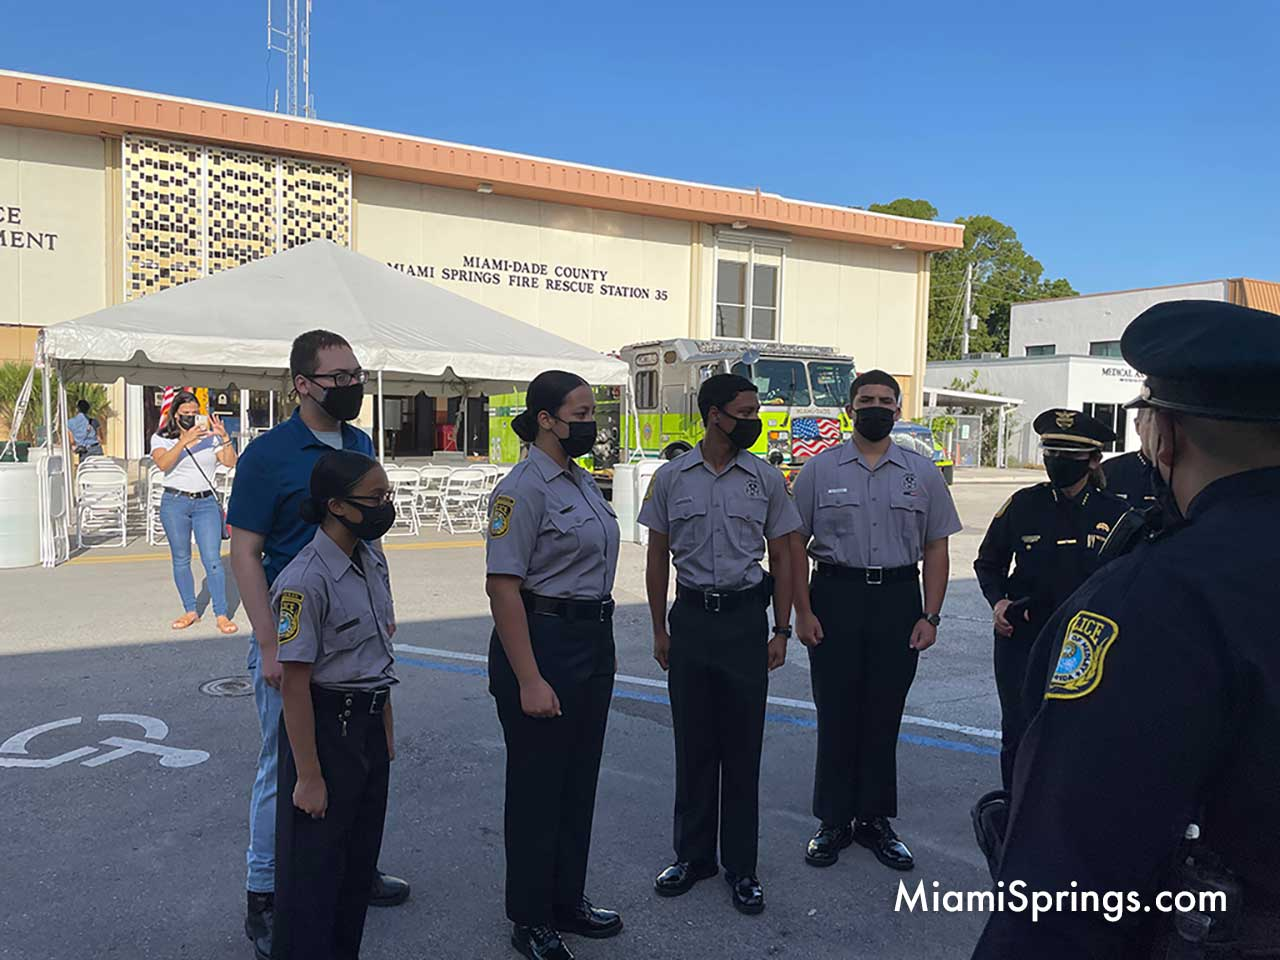 Miami Springs First Responders